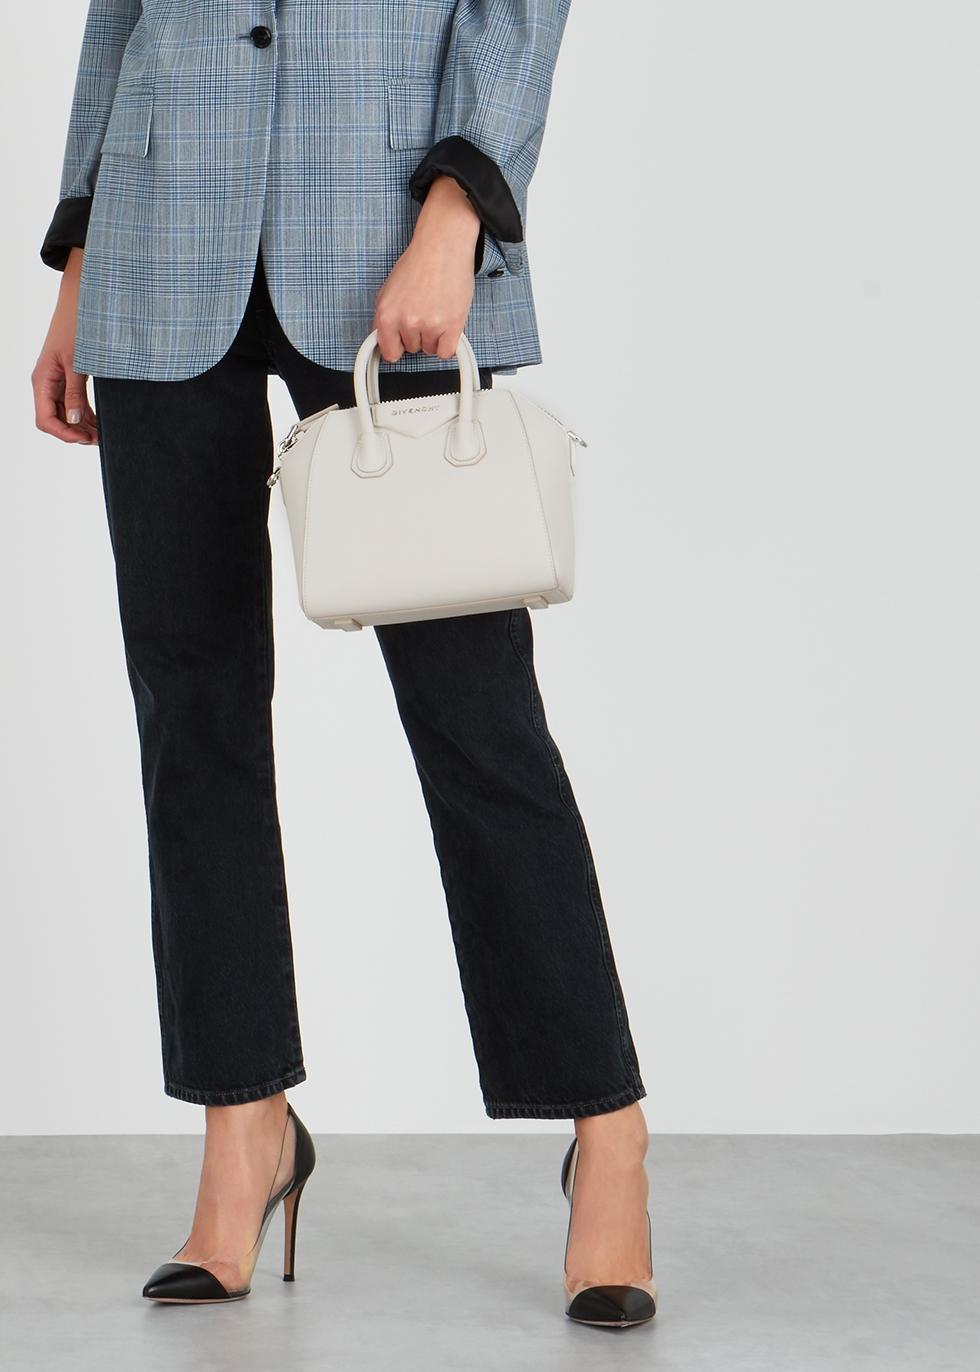 1300417ecde Givenchy - Designer Clothing, Bags, Scarves - Harvey Nichols